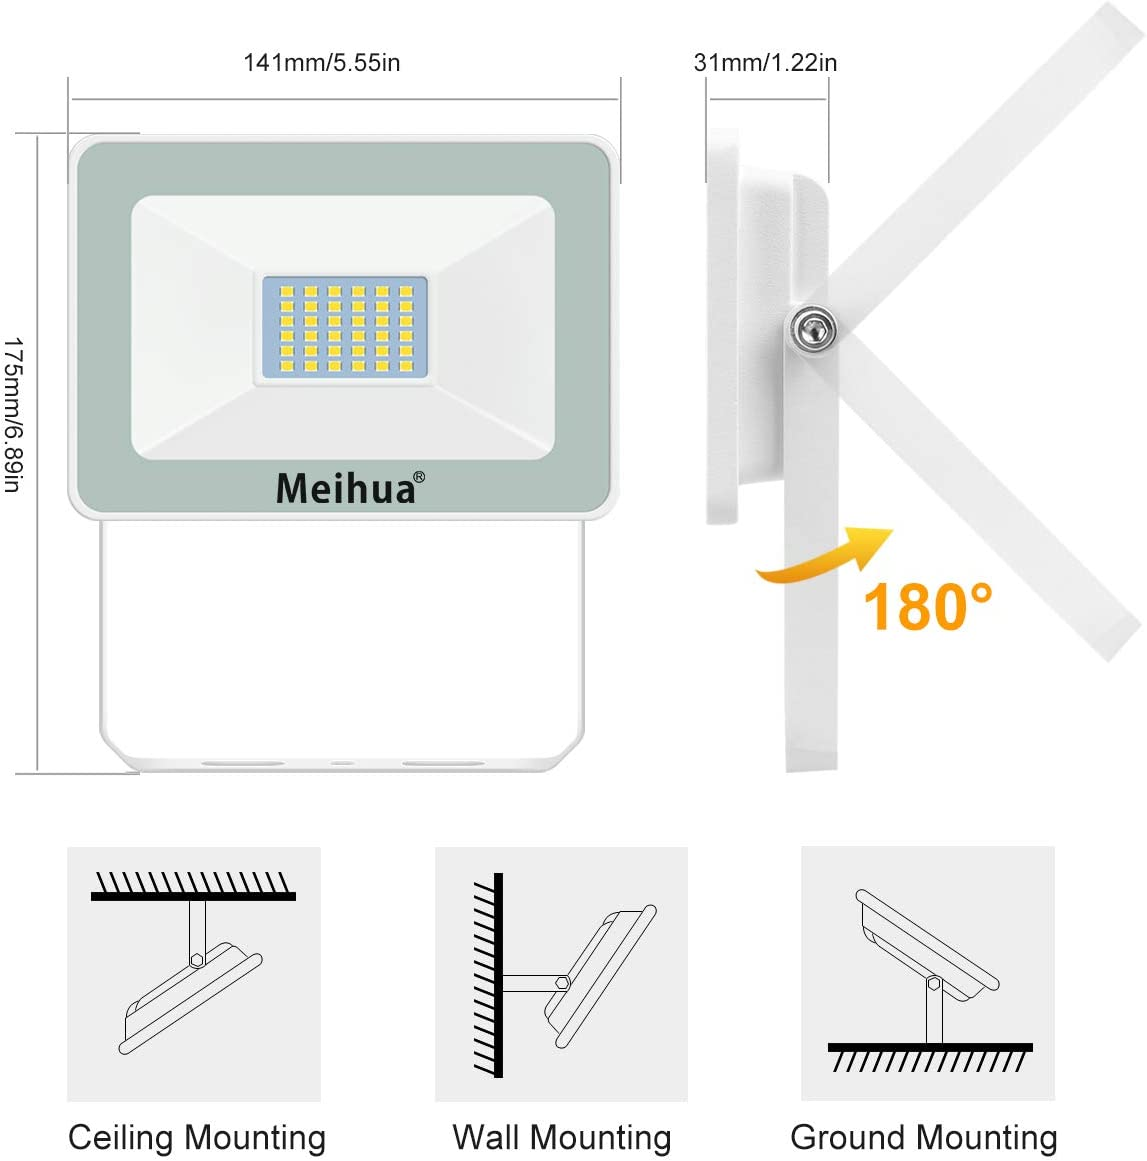 Jard/ín Meihua Foco LED de 15W Foco LED Exterior 1500LM Impermeable IP66 Seguridad Floodlight para Patio Foco Proyector LED Luz Fria 6500K Garaje Parking